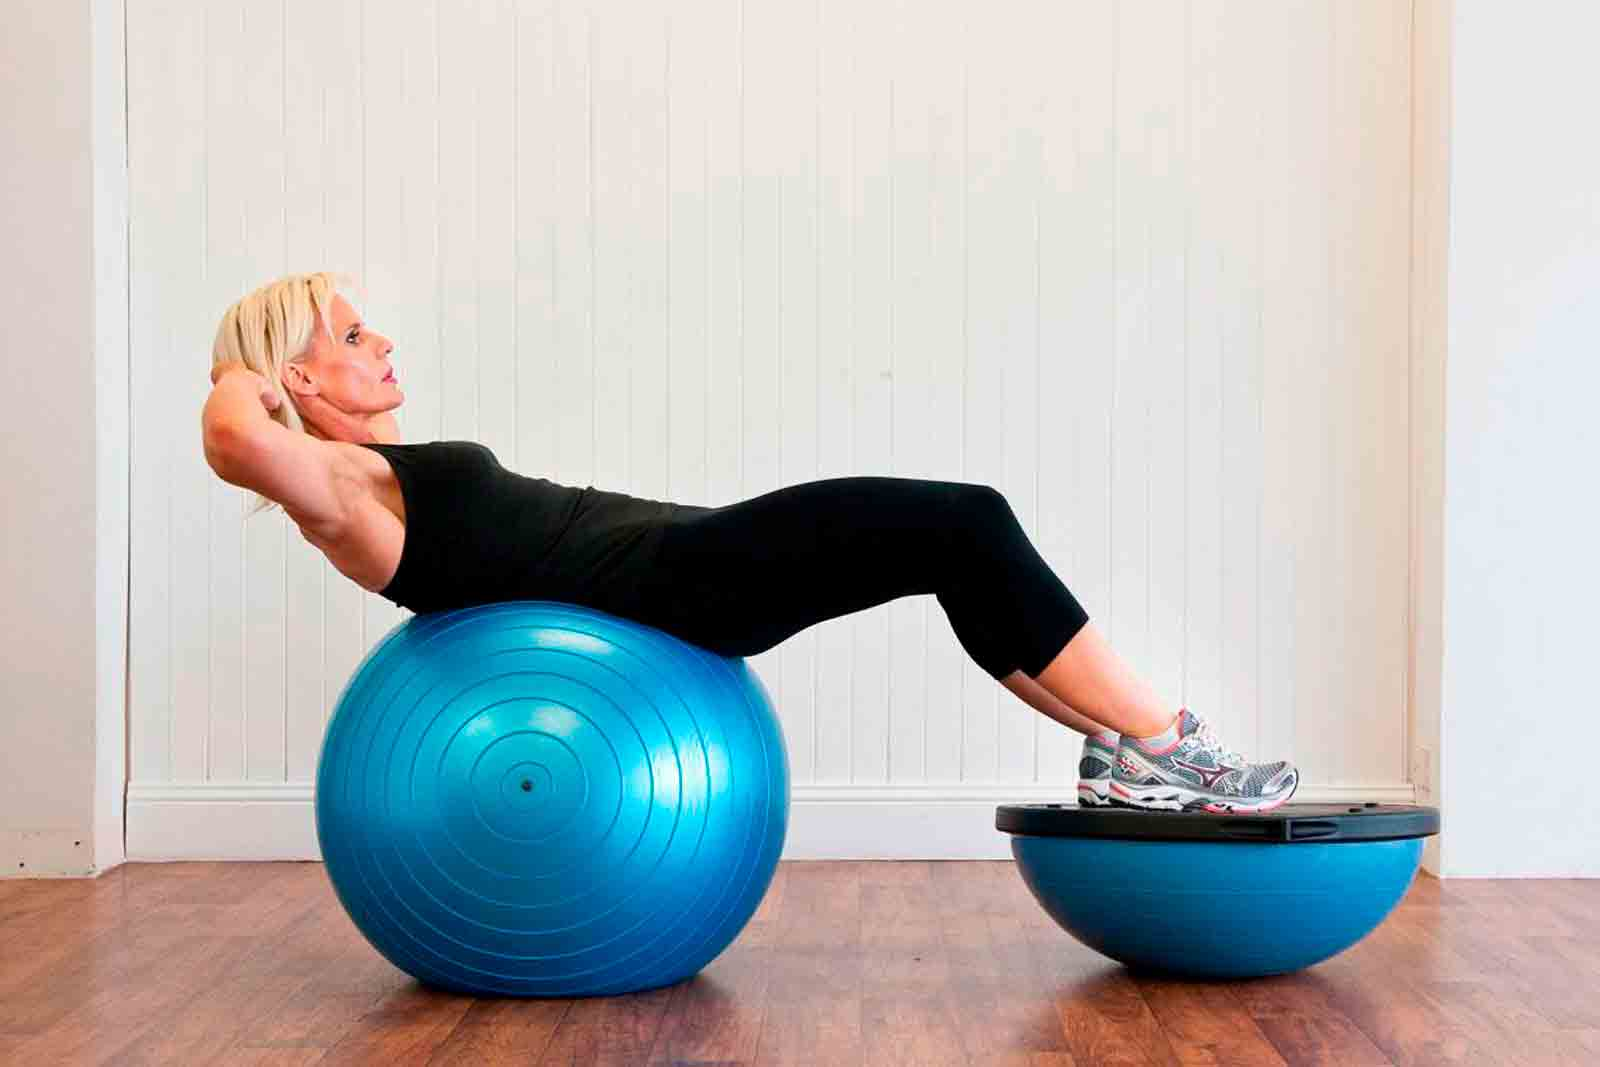 Material para realizar actividades deportivas